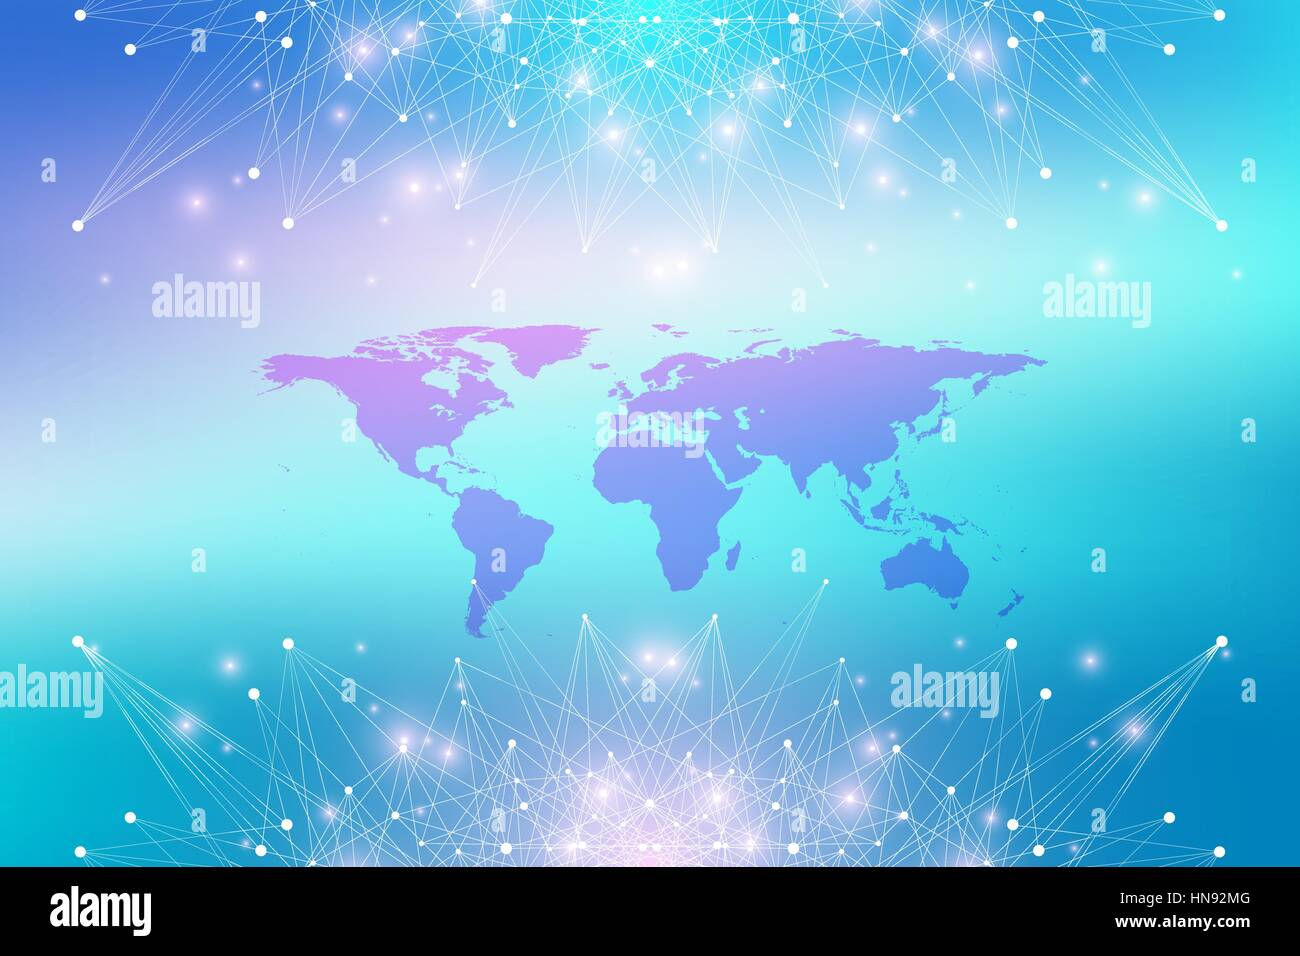 Geometric graphic background communication with world map big data geometric graphic background communication with world map big data complex with compounds perspective backdrop minimal array digital data visualization gumiabroncs Choice Image